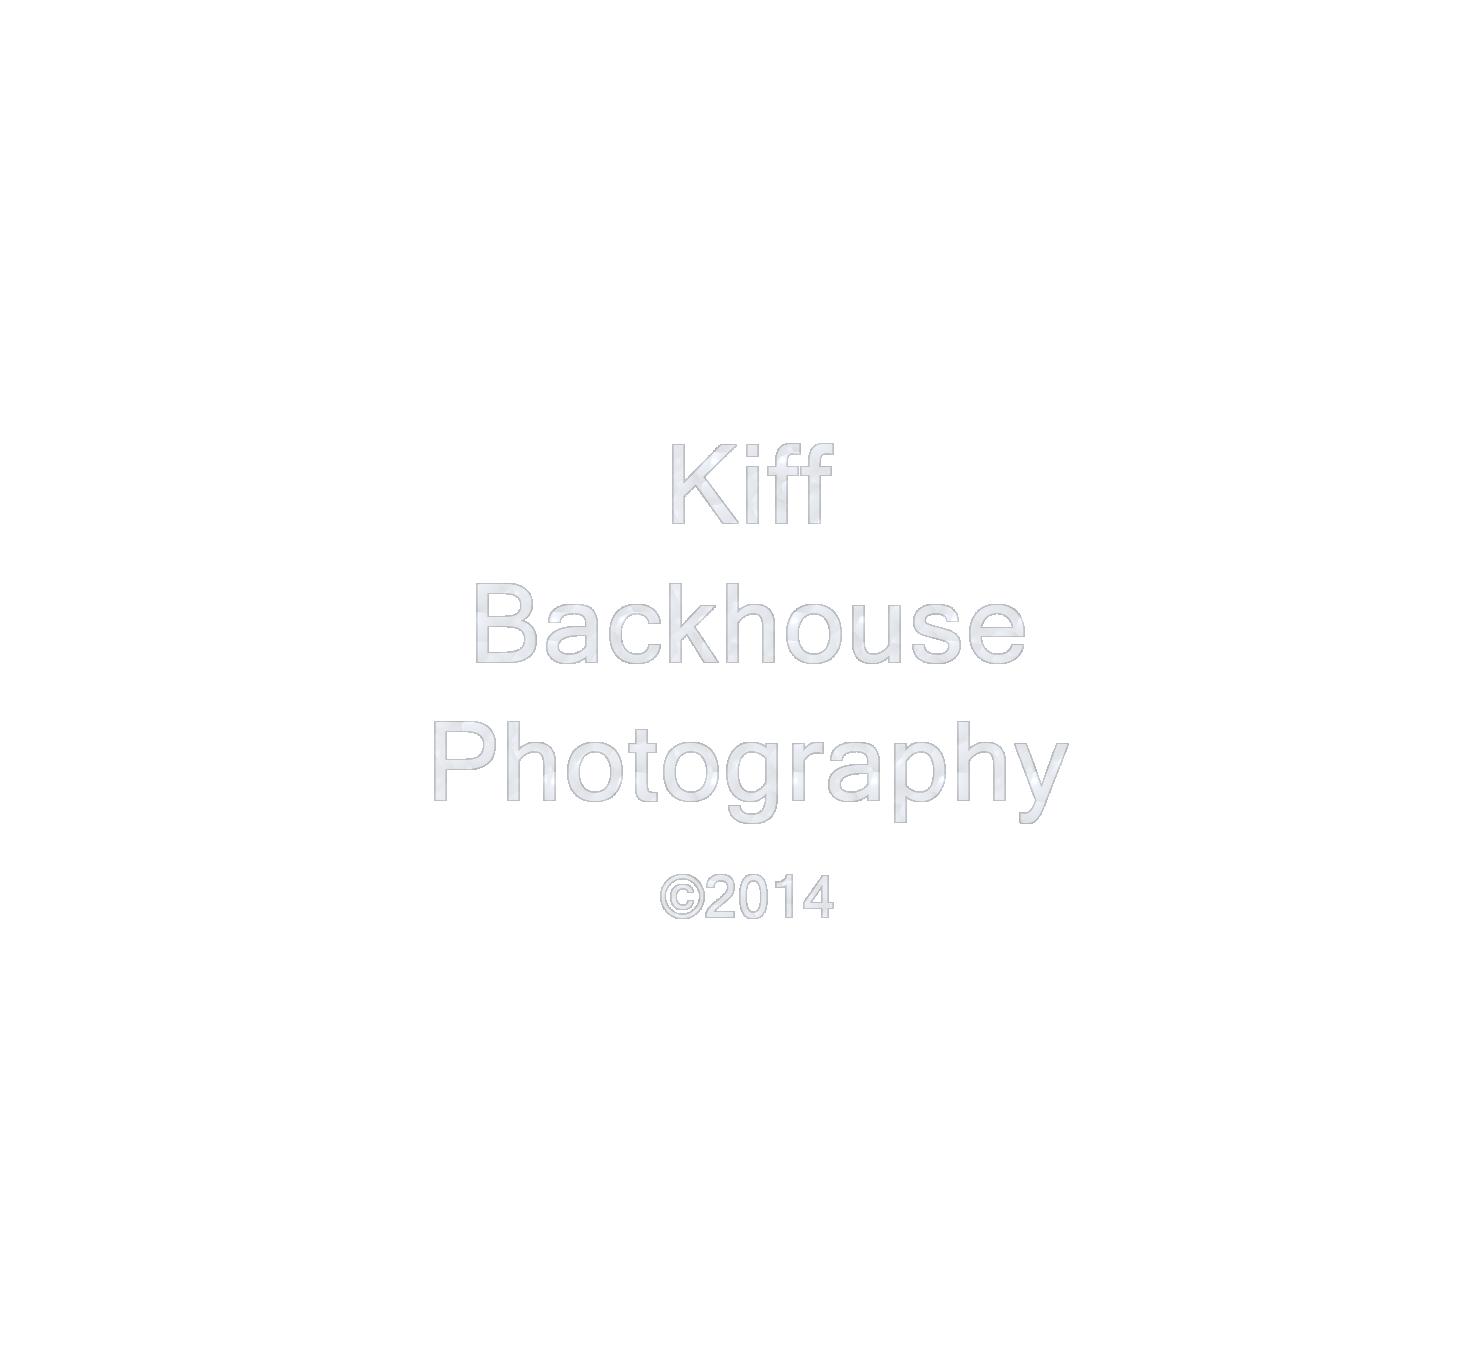 Kiff Backhouse Photography